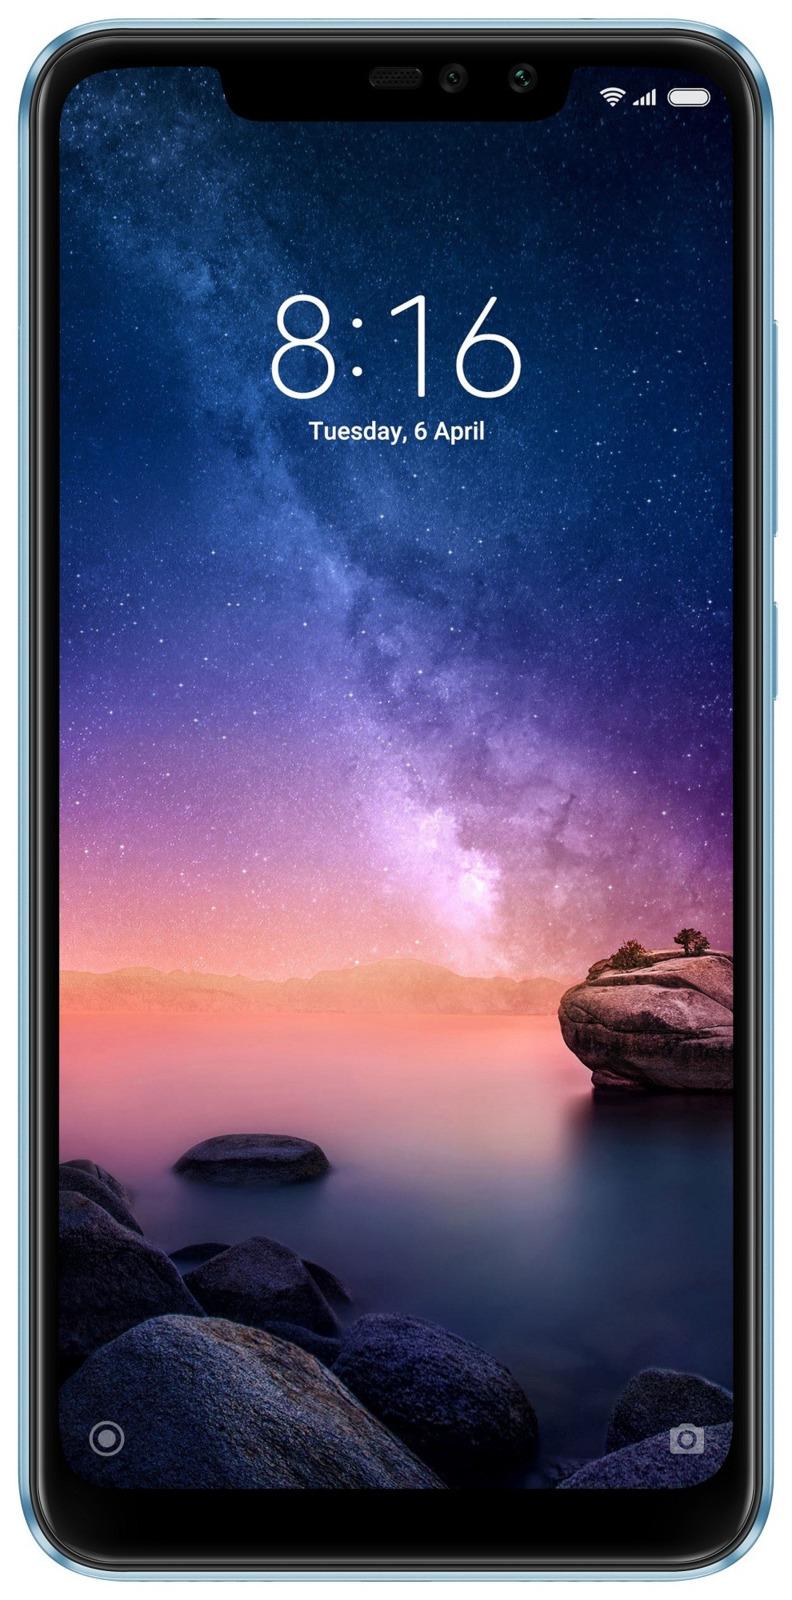 Смартфон Xiaomi Redmi Note 6 Pro 64 GB, синий смартфон xiaomi mi max 3 black 8 core 1 8ghz 4gb 64gb 6 9